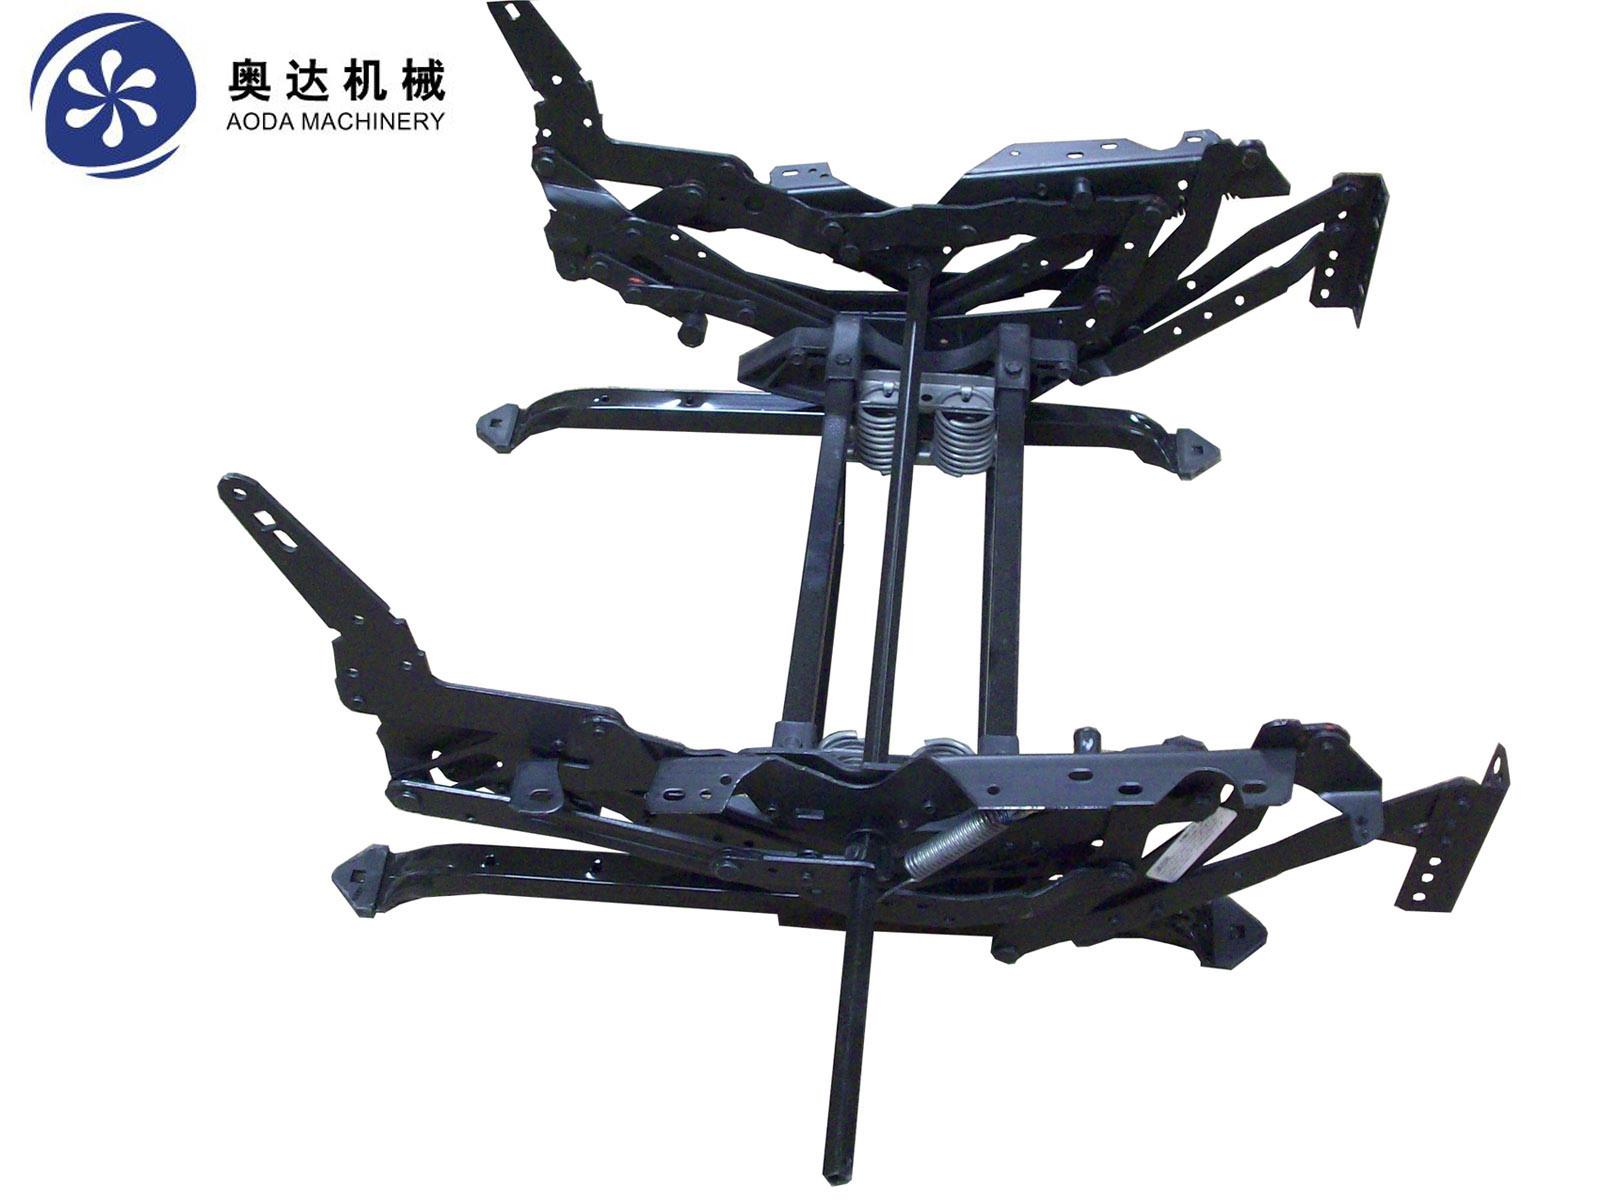 China Rocker Recliner Mechanism Ad4183 China Recliner